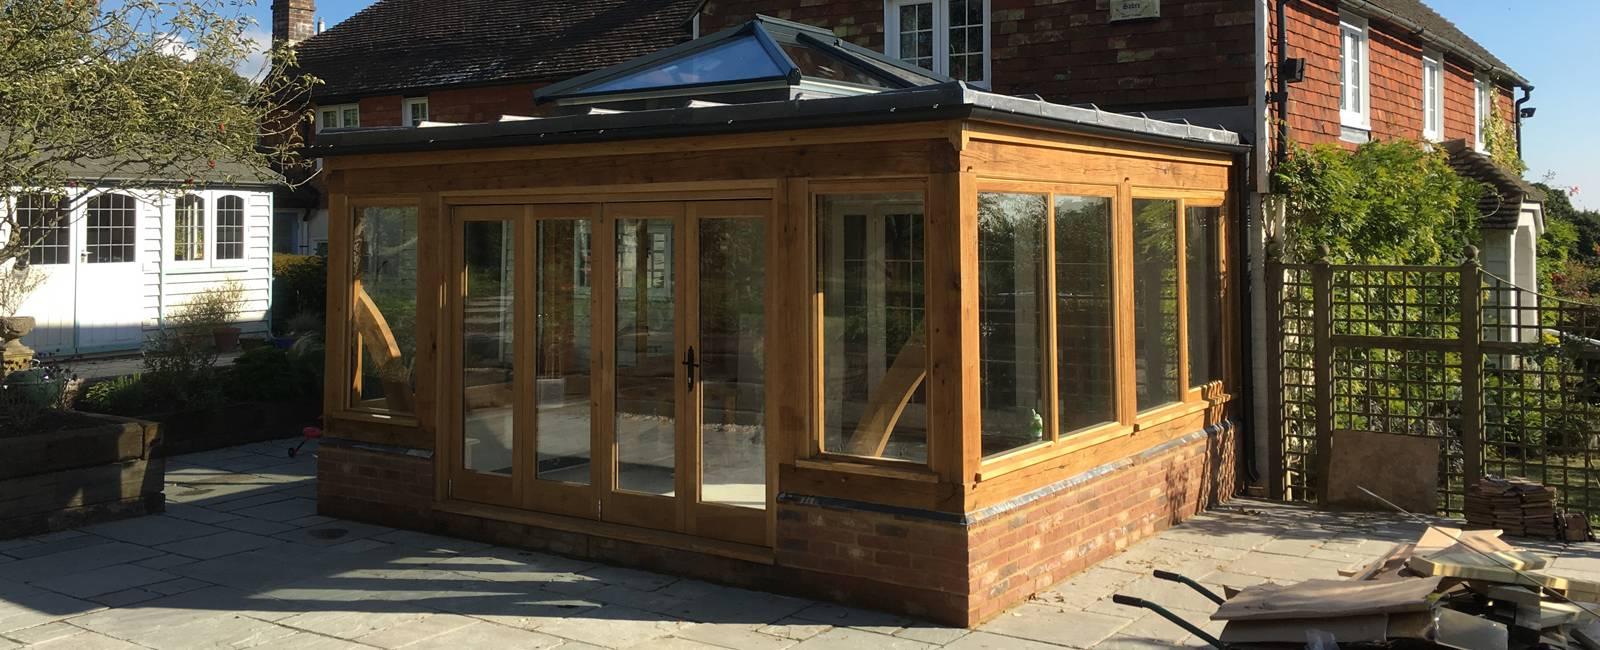 oak-framed-conservatory.jpg